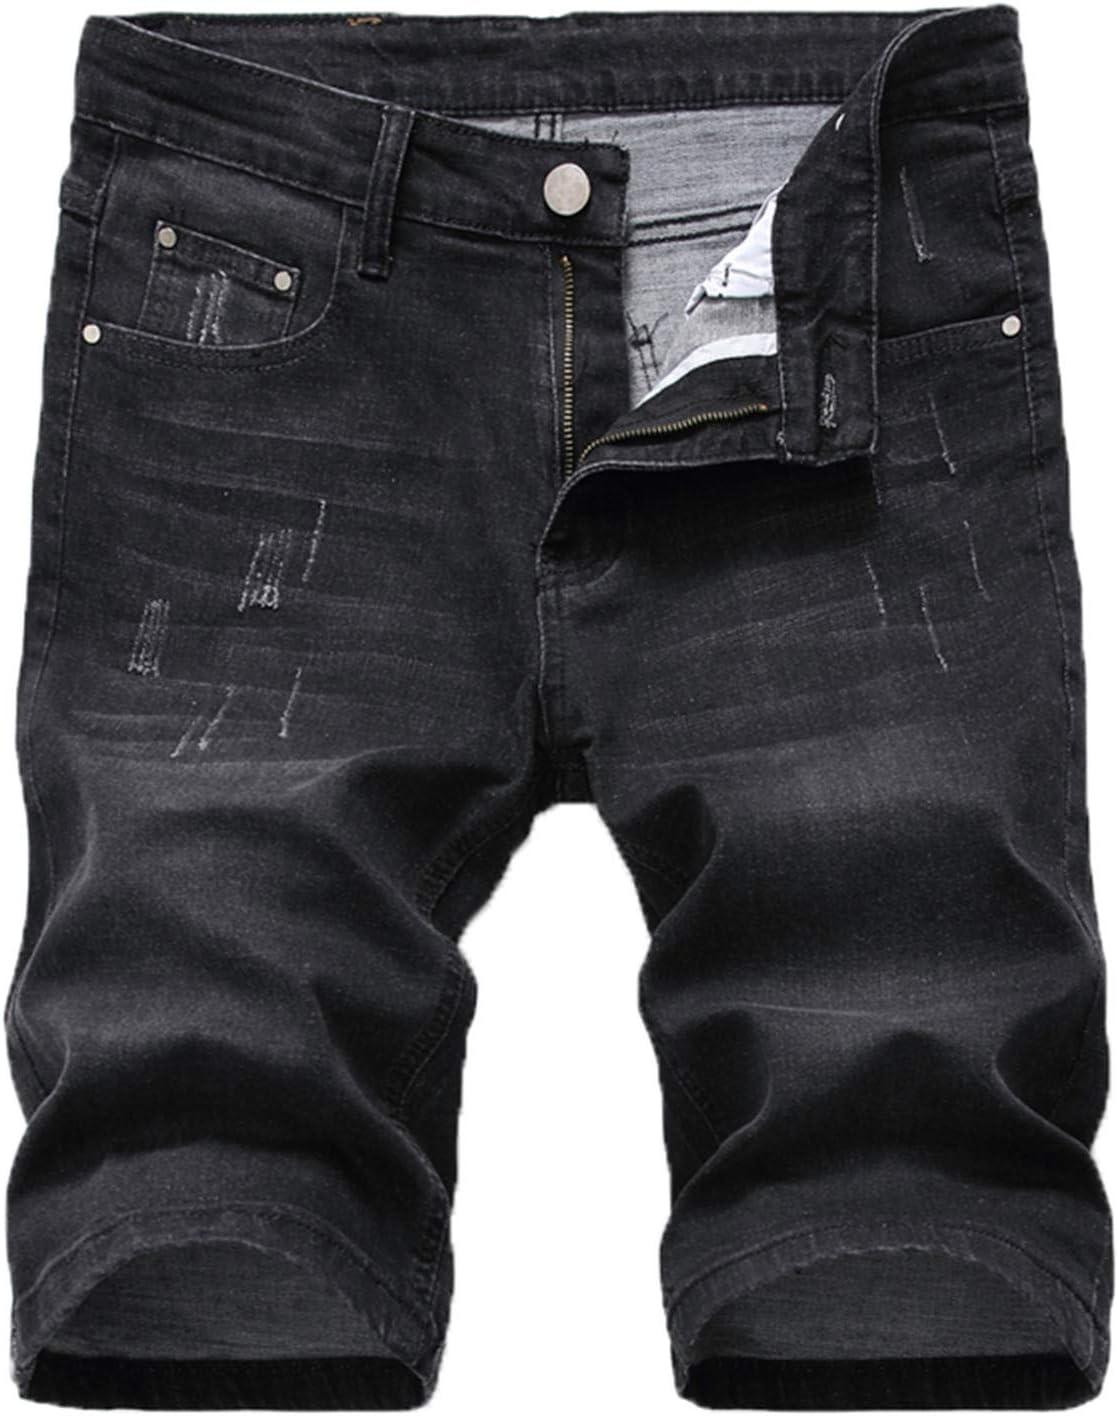 Yiqinyuan Summer Men's Ripped Short Biker Jeans Fashion Black Gray Denim Shorts Male Clothes 1006-Black 30